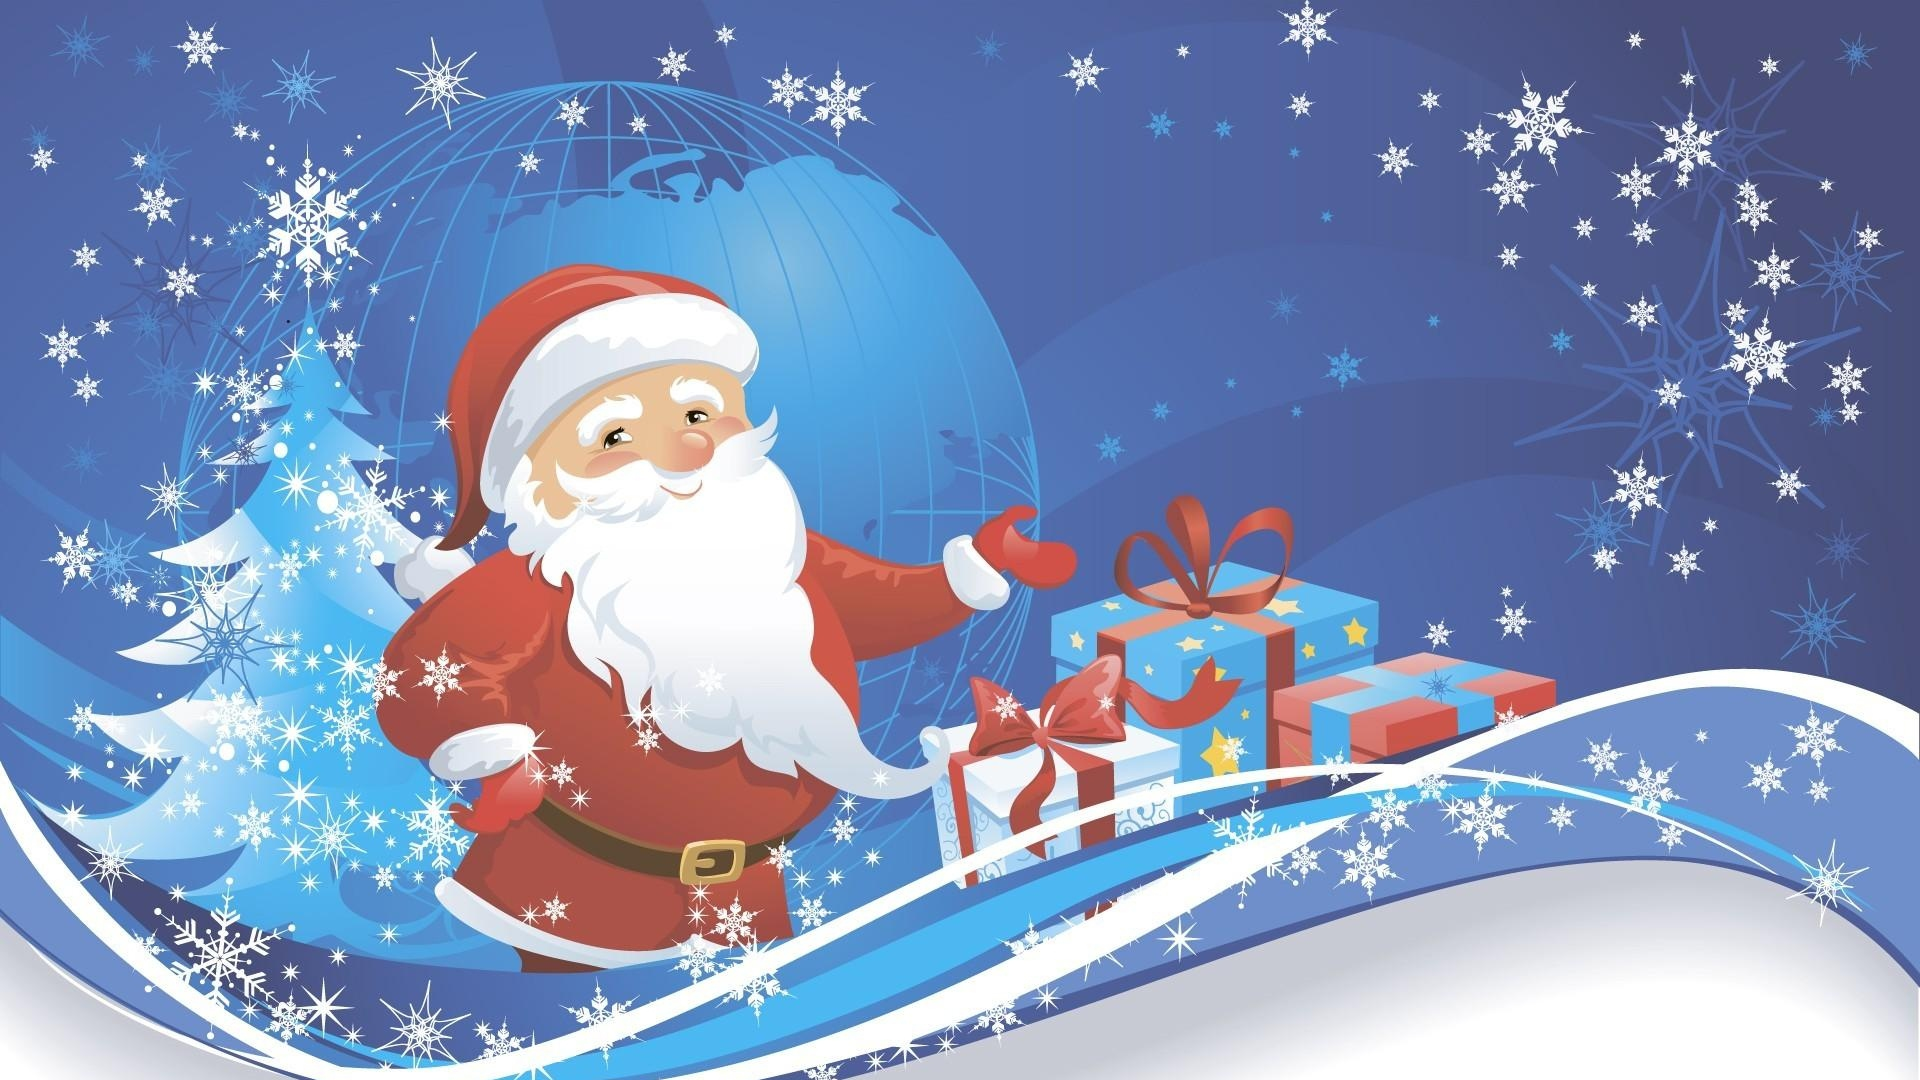 santa claus presents tree - Santa Claus With Presents